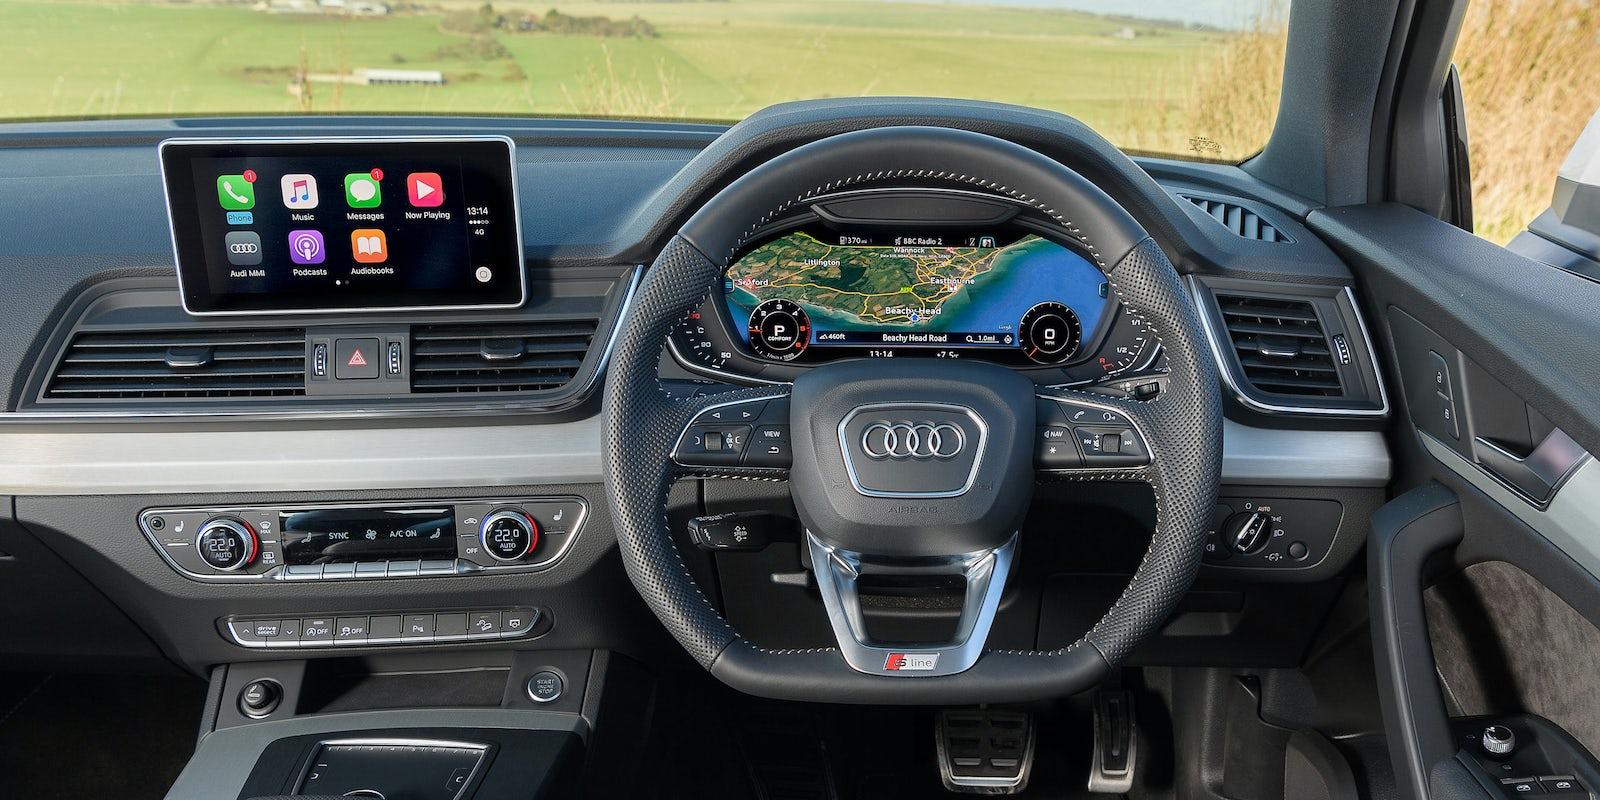 Audi Q Interior Infotainment Carwow - Audi q5